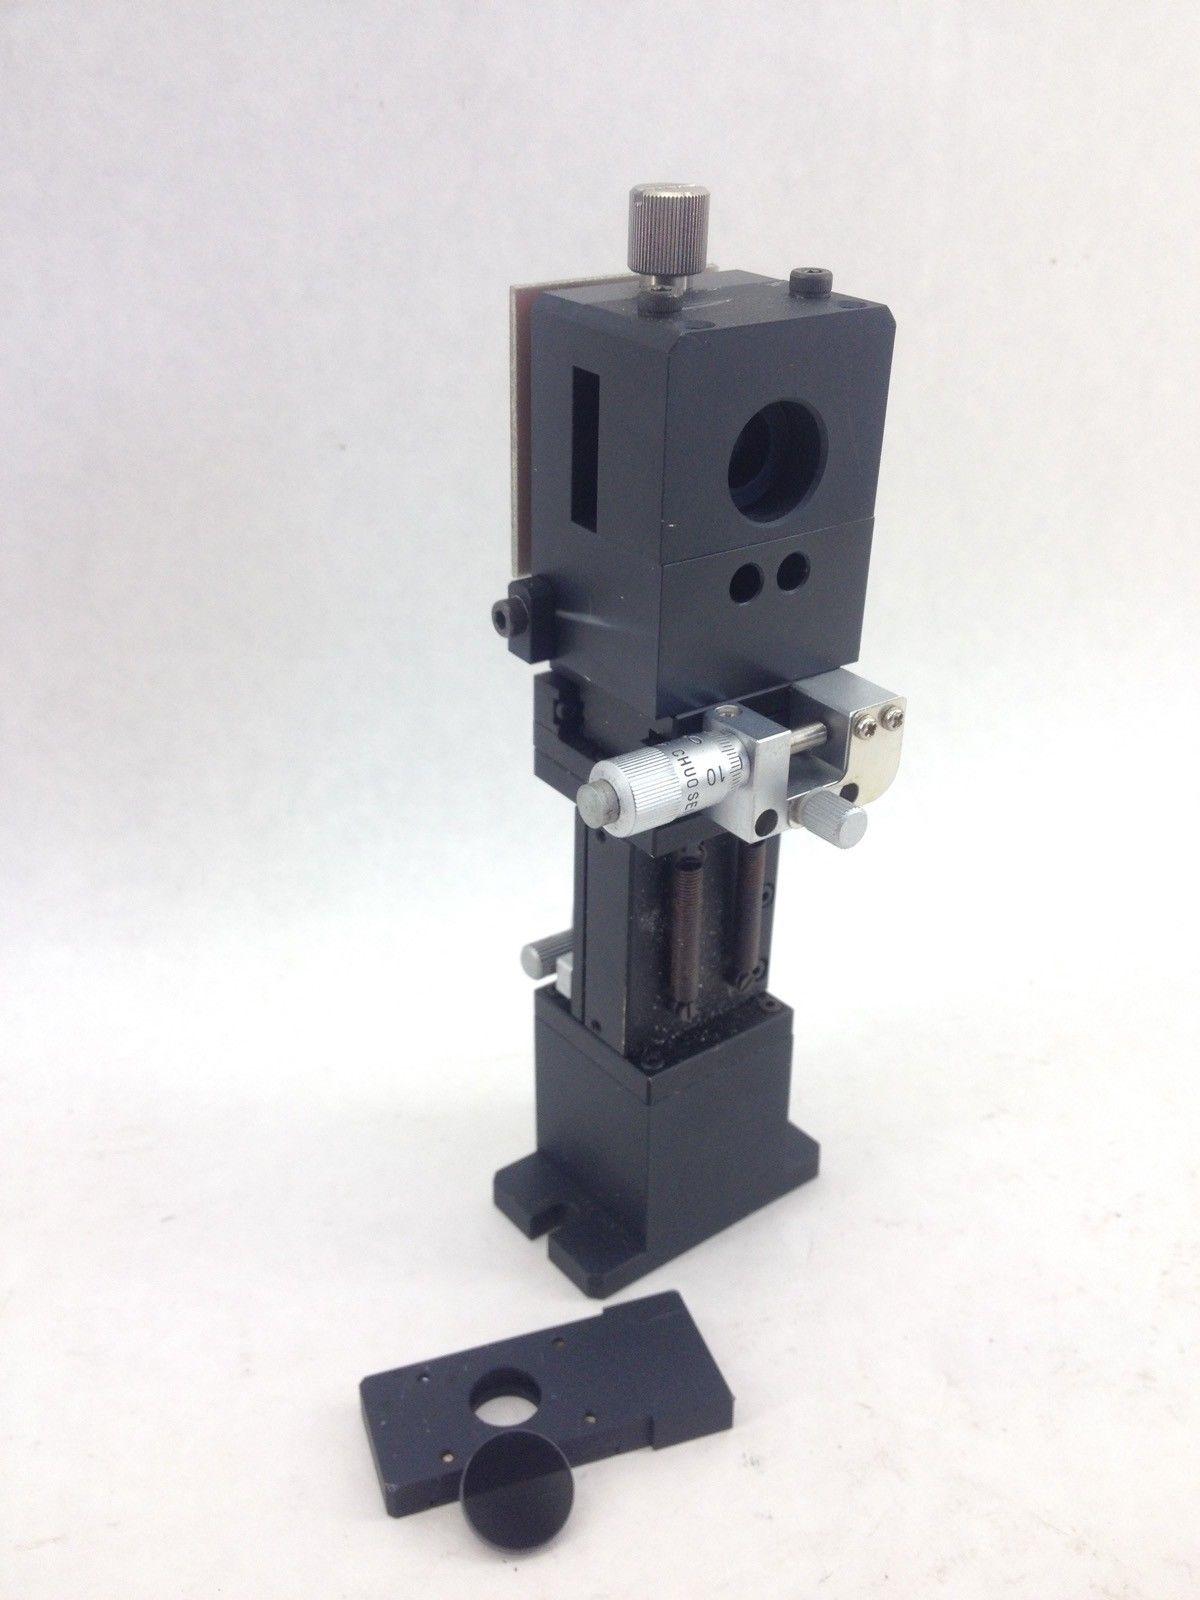 OPTOMECHANICAL ASSY W/ 021128 MICRO-CONTROLLER BOARD (H330) 1